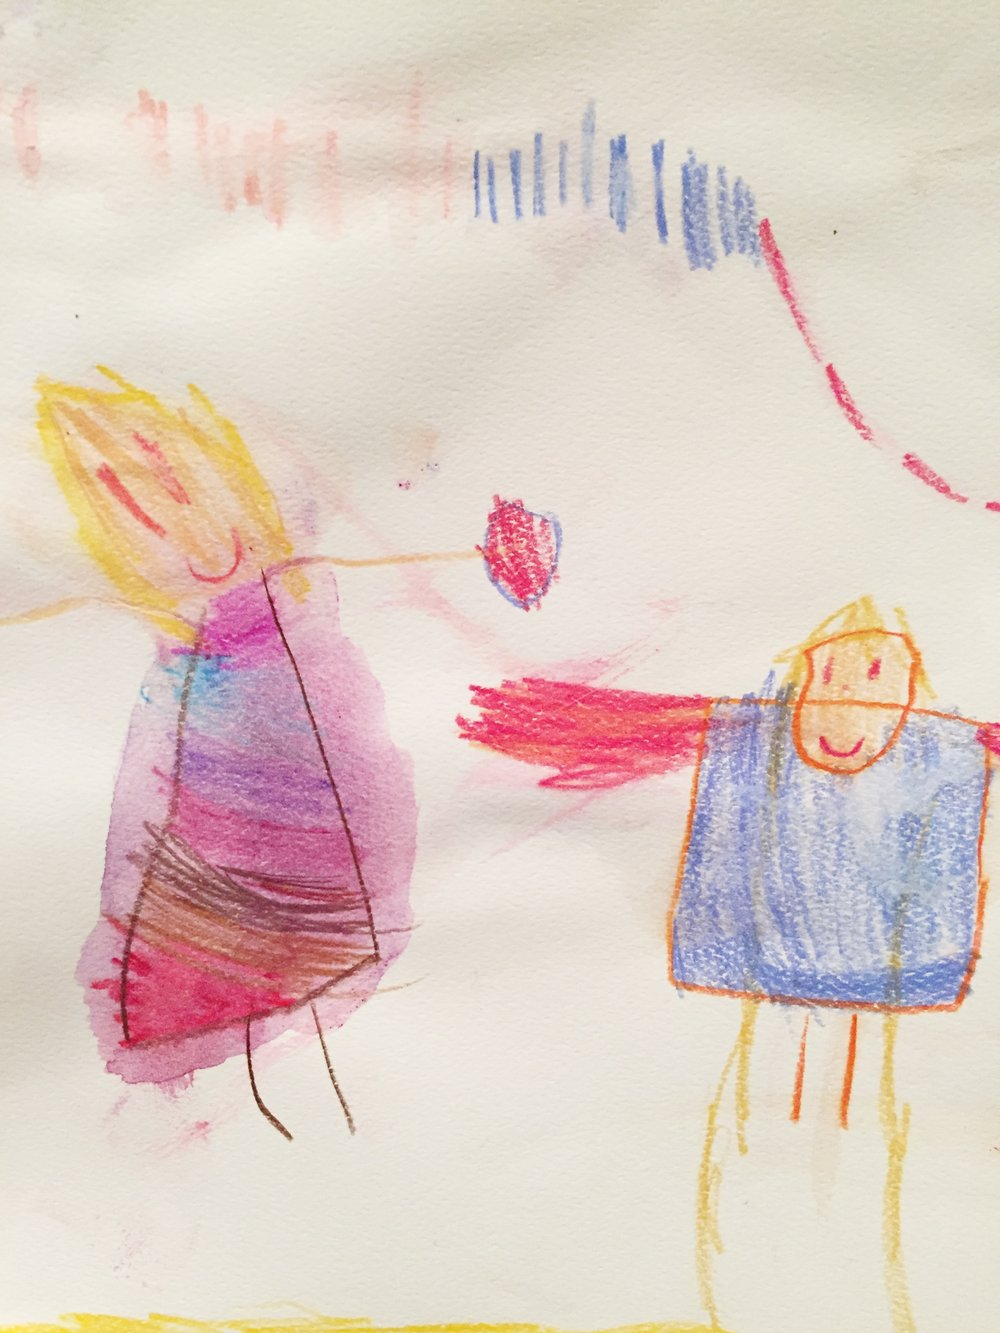 Self-portrait with Picasso and confetti. Adeline, age 4.